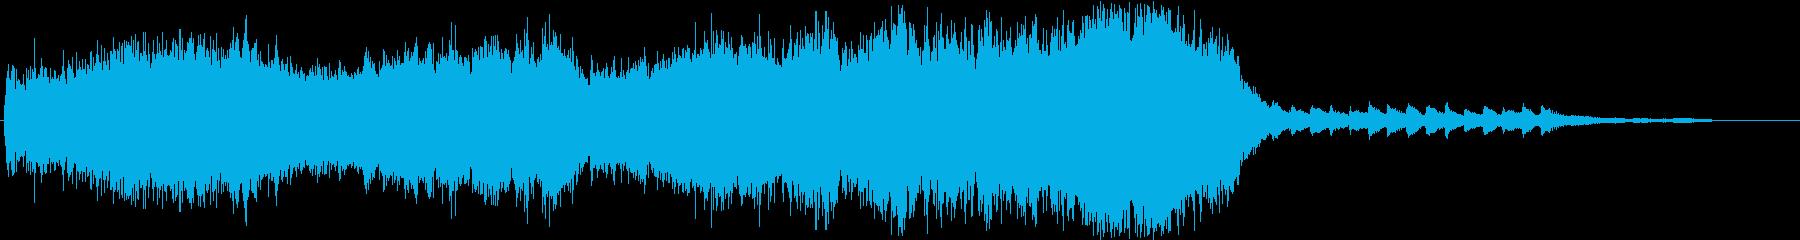 Cold Lake 30秒の再生済みの波形